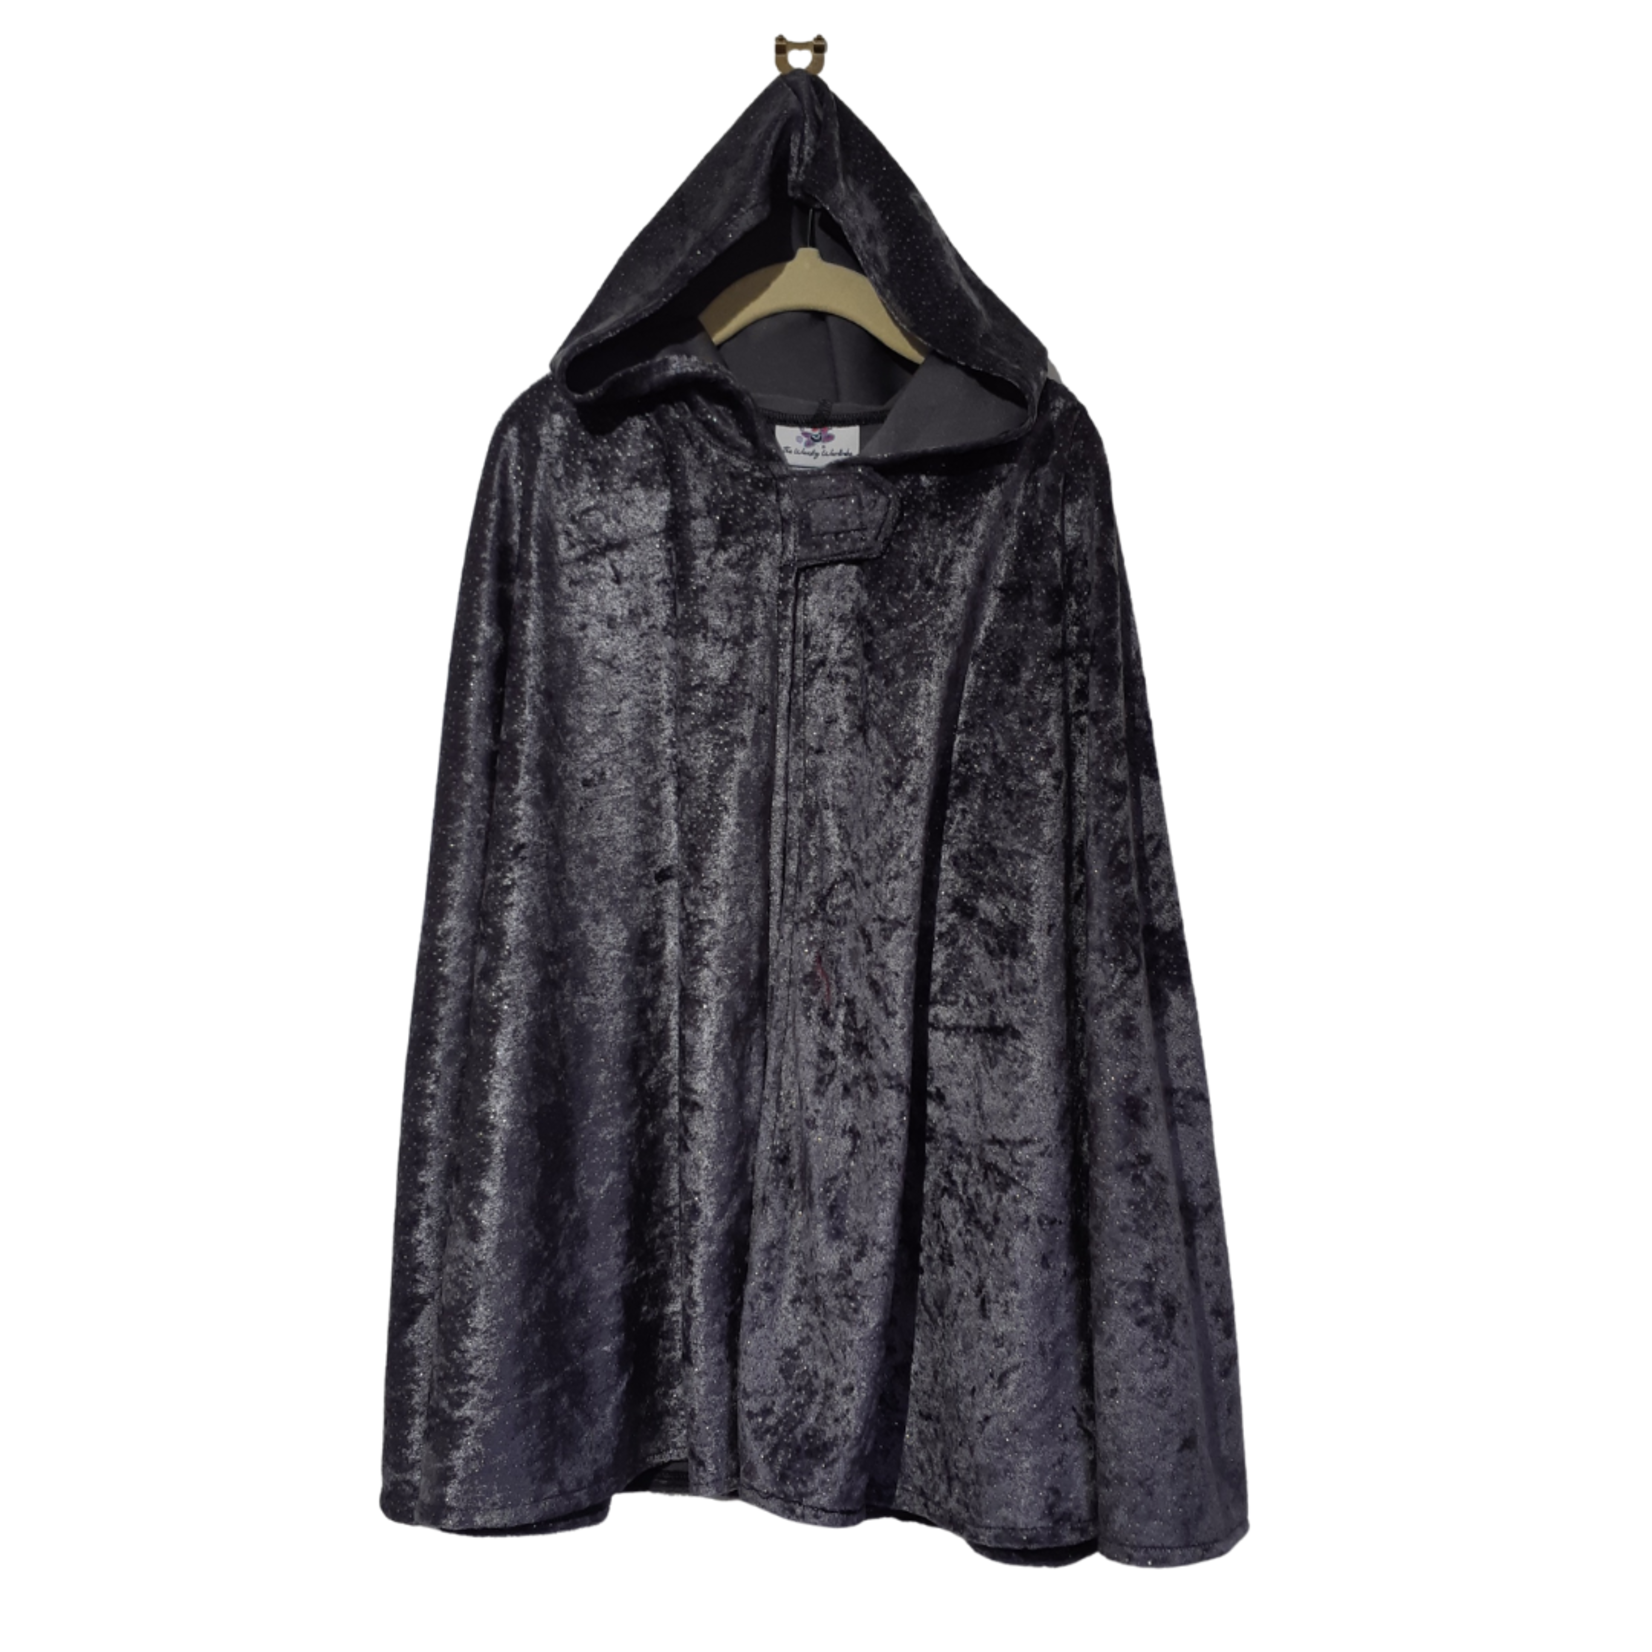 Wacky Wardrobe Wacky Wardrobe Cape Grey Speckle - Medium